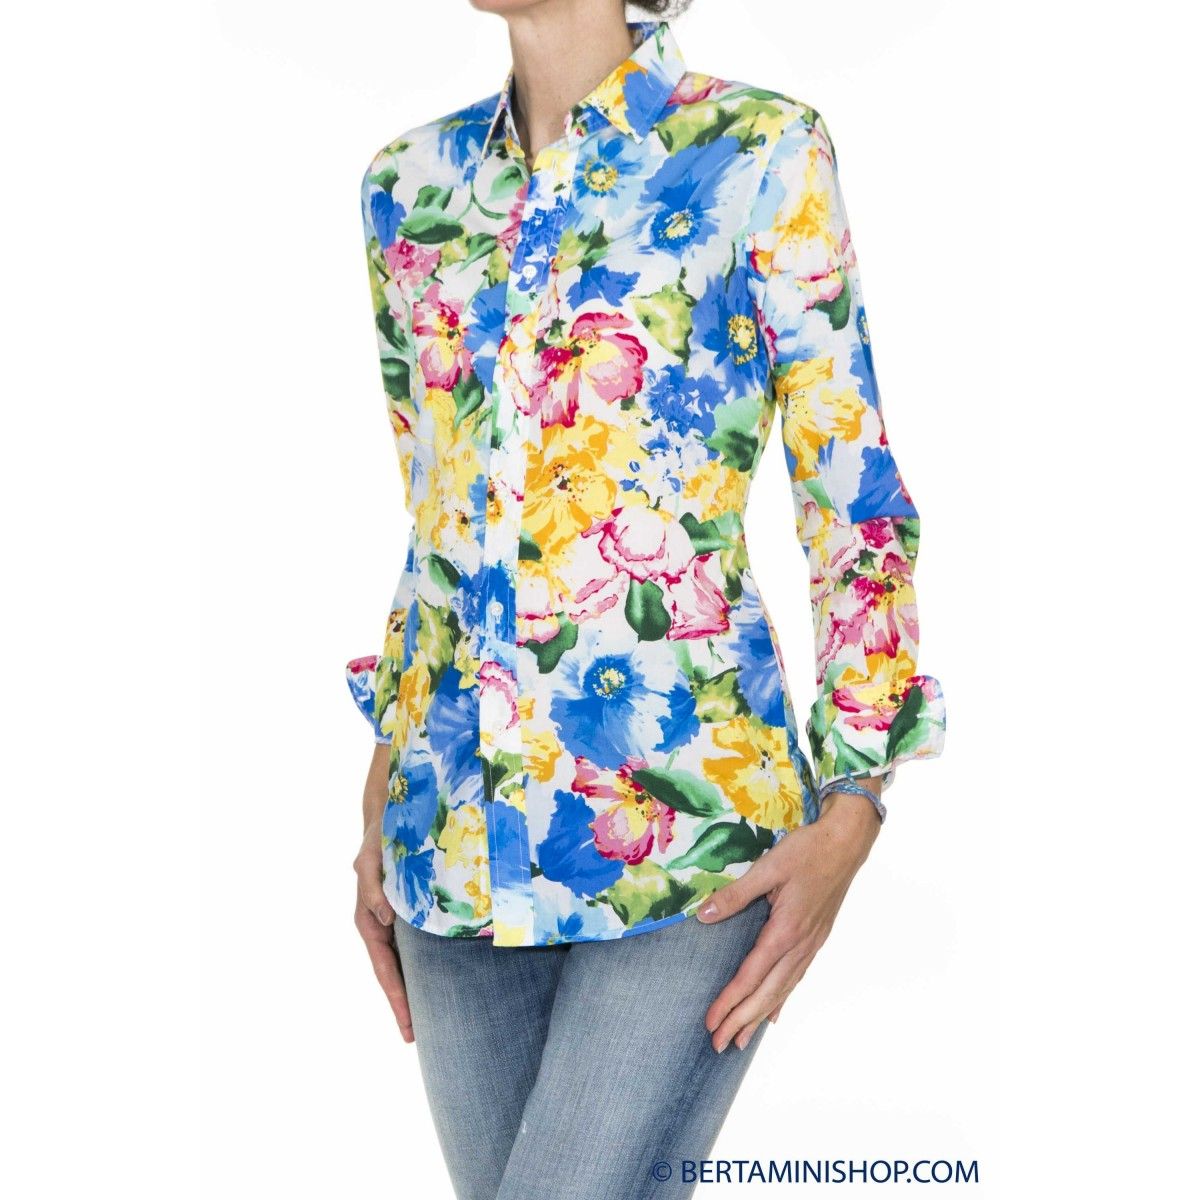 Shirt Ralph Lauren Woman - V33Ih723Bh723 M4H03 - Fiorata blu